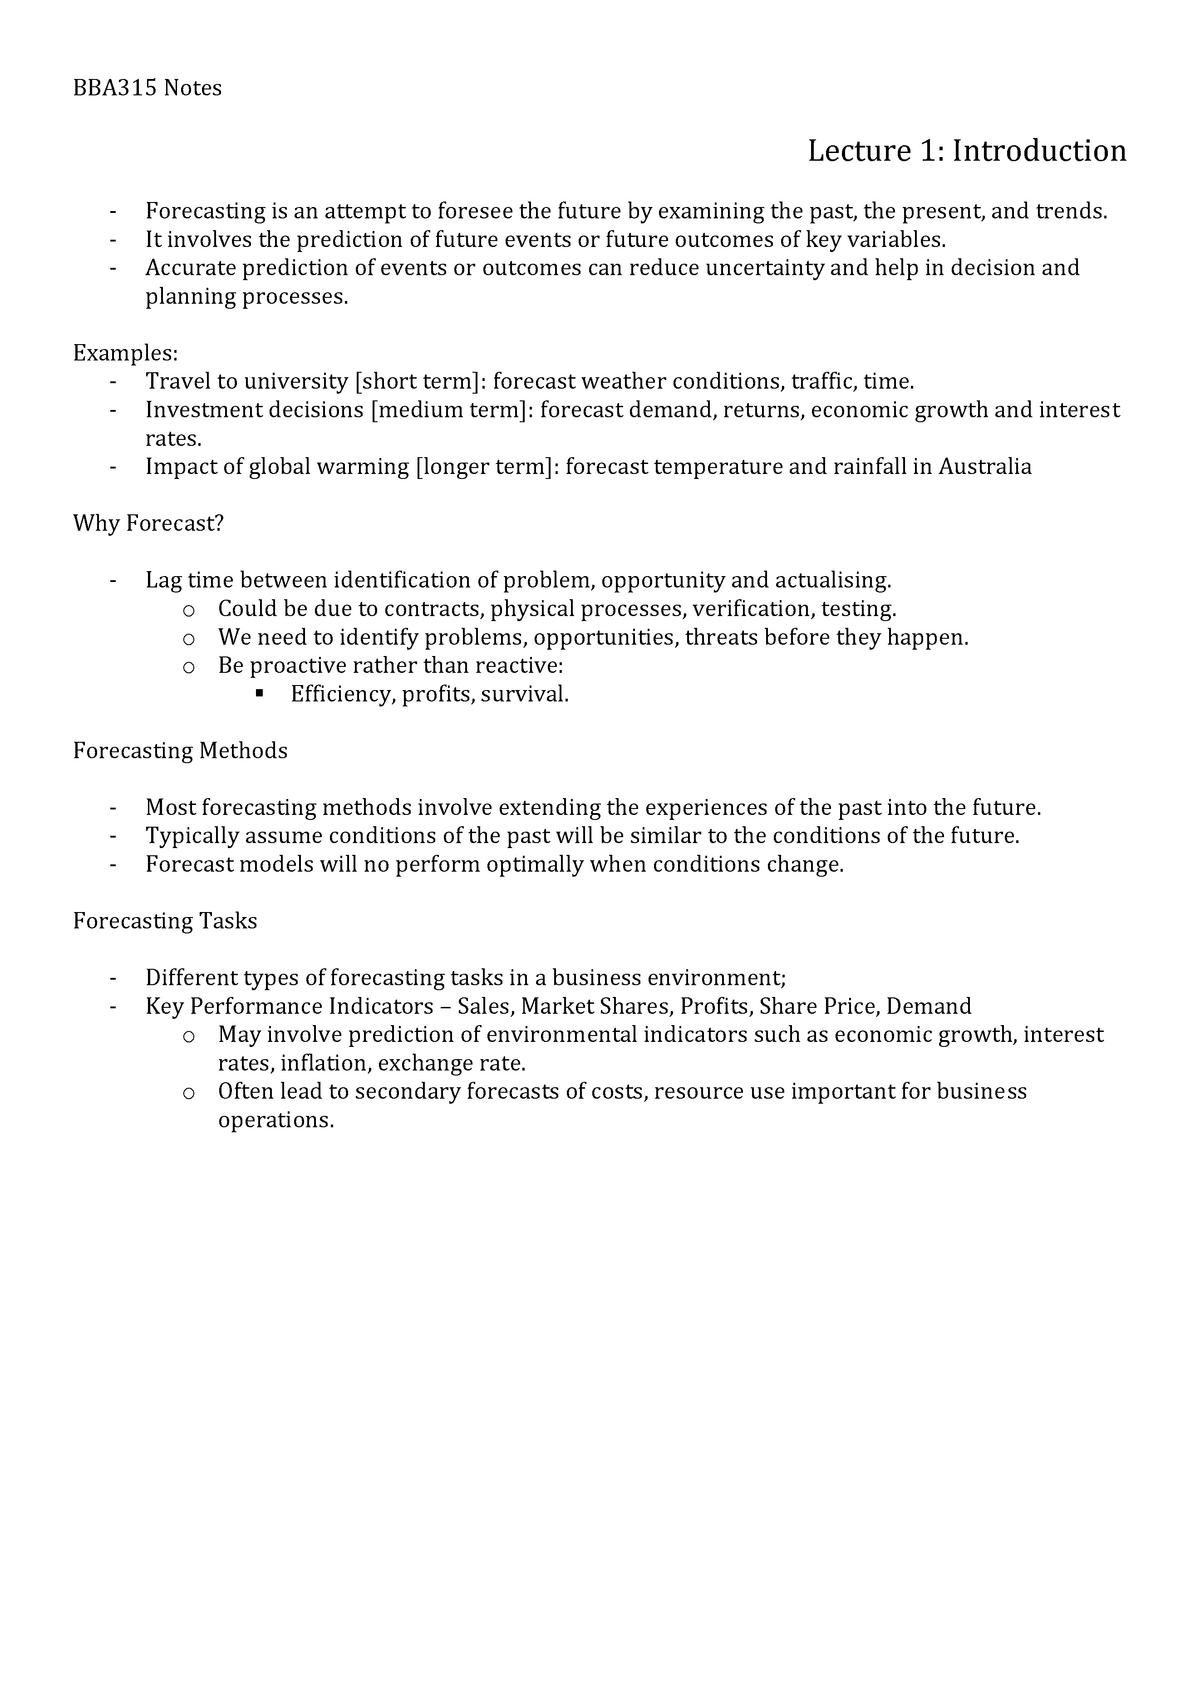 BBA315 Notes - BBA315: Business Forecasting - StuDocu